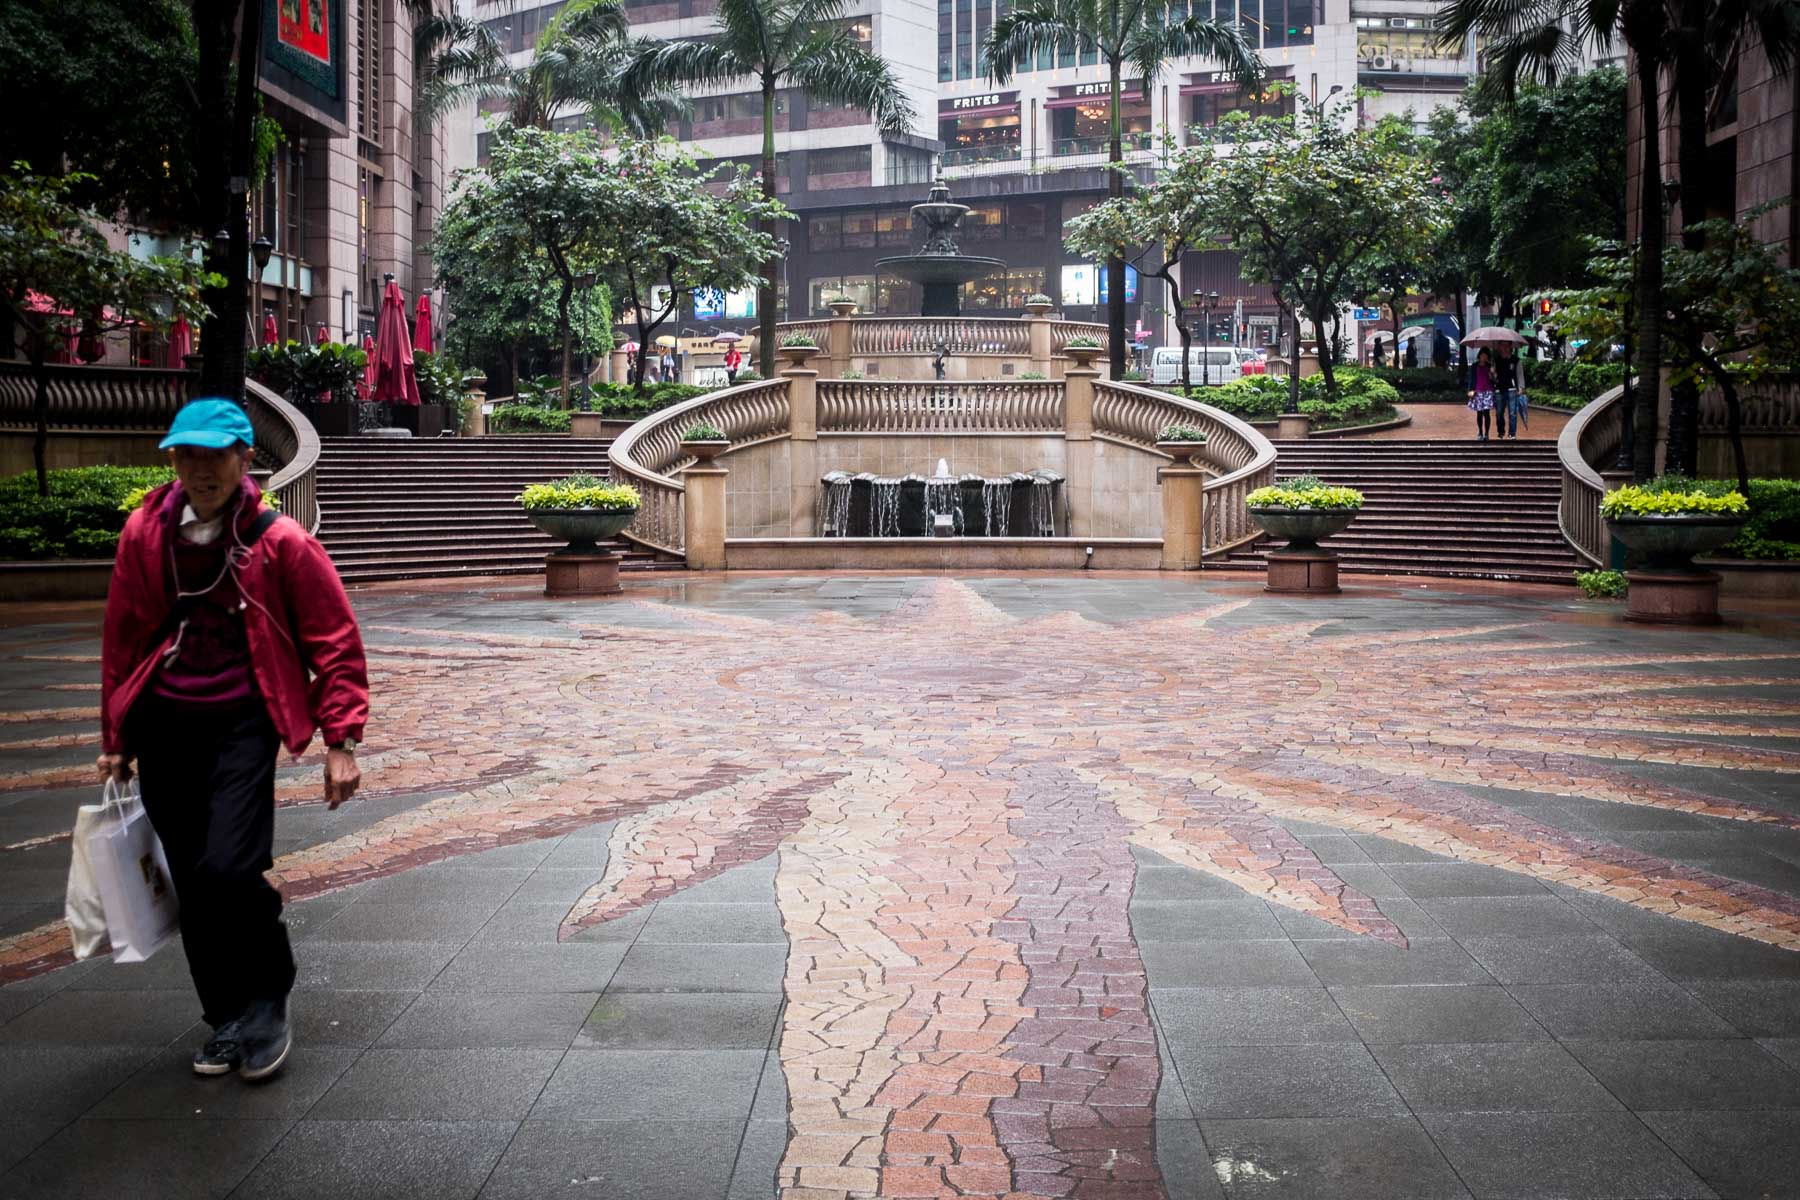 HK 2016 (49 of 66)